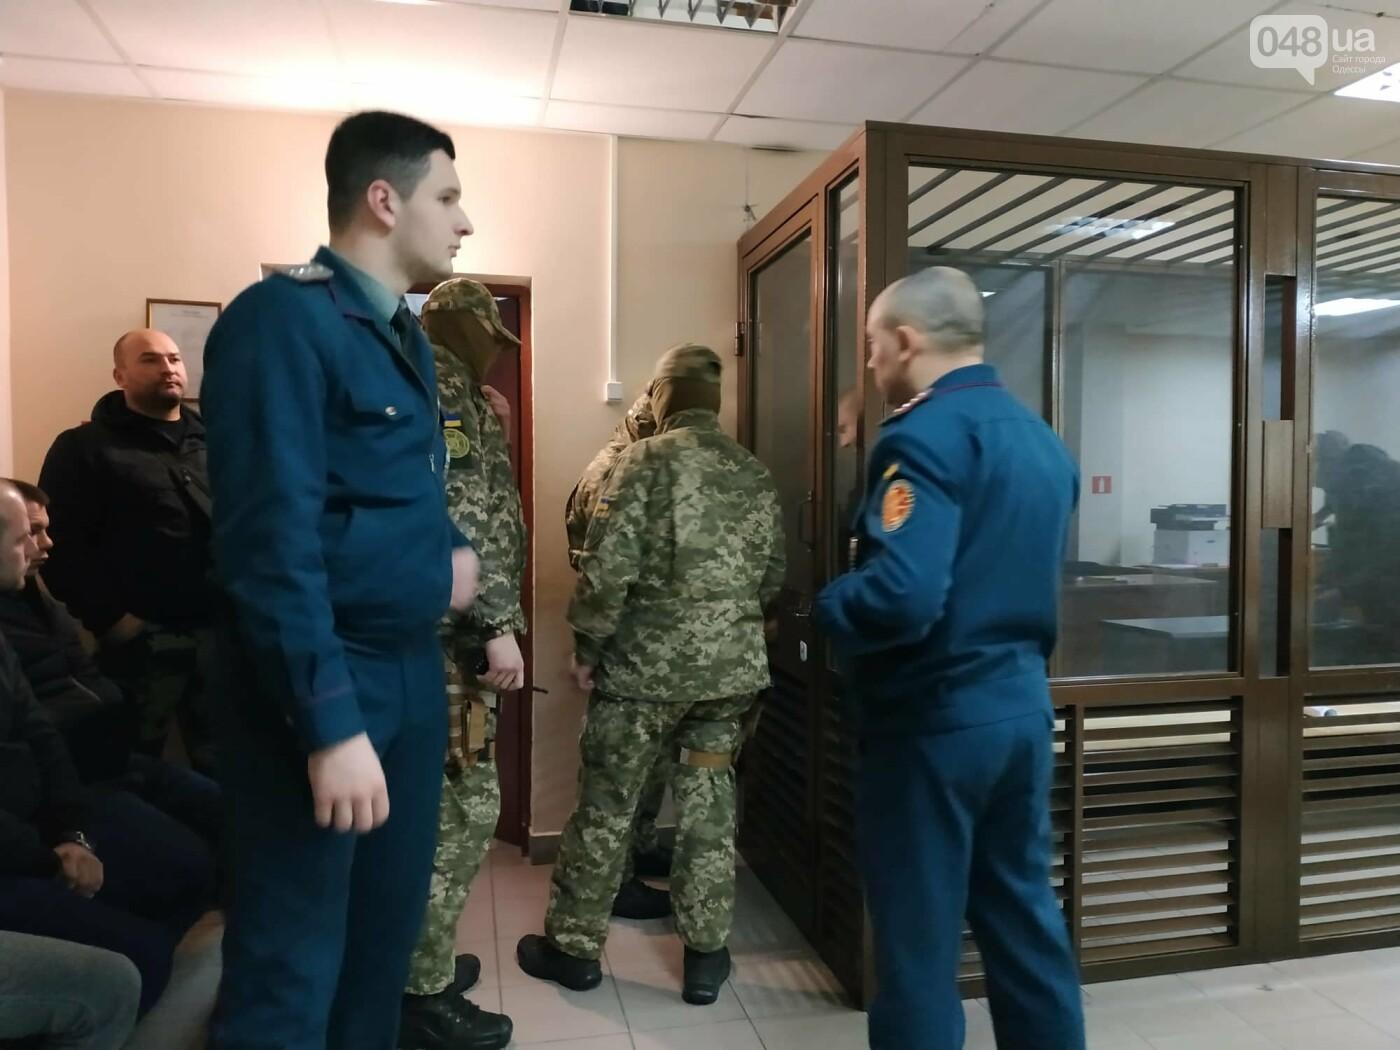 Одесскому псевдо-активисту избрали меру пресечения, - ФОТО, фото-3, Фото: Александр Жирносенко